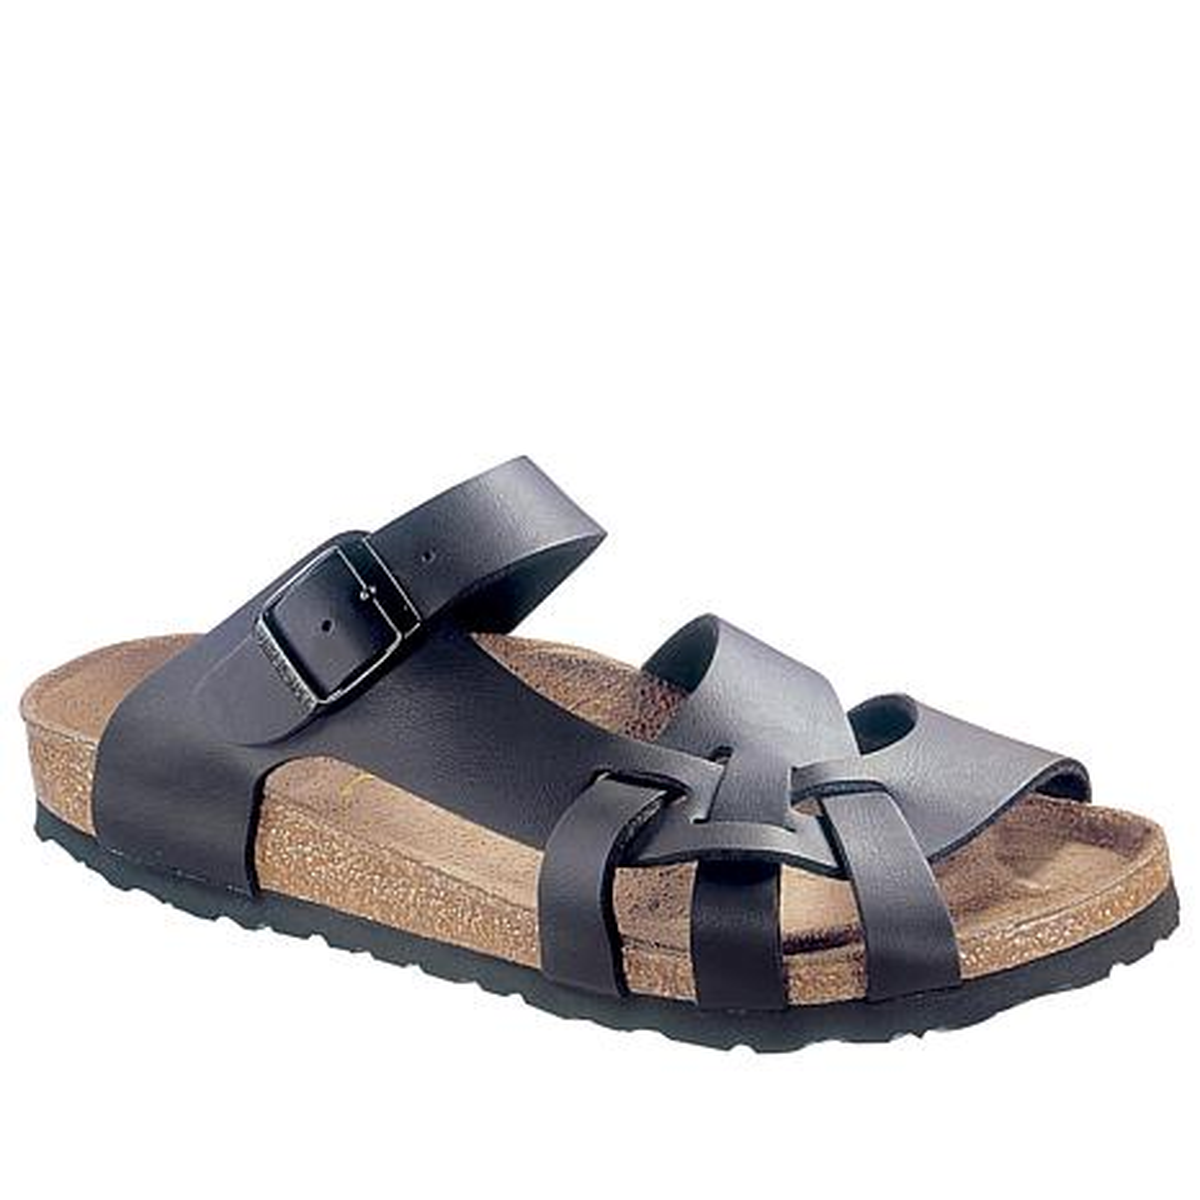 437707b1d51 Hsn Birkenstock Sandals